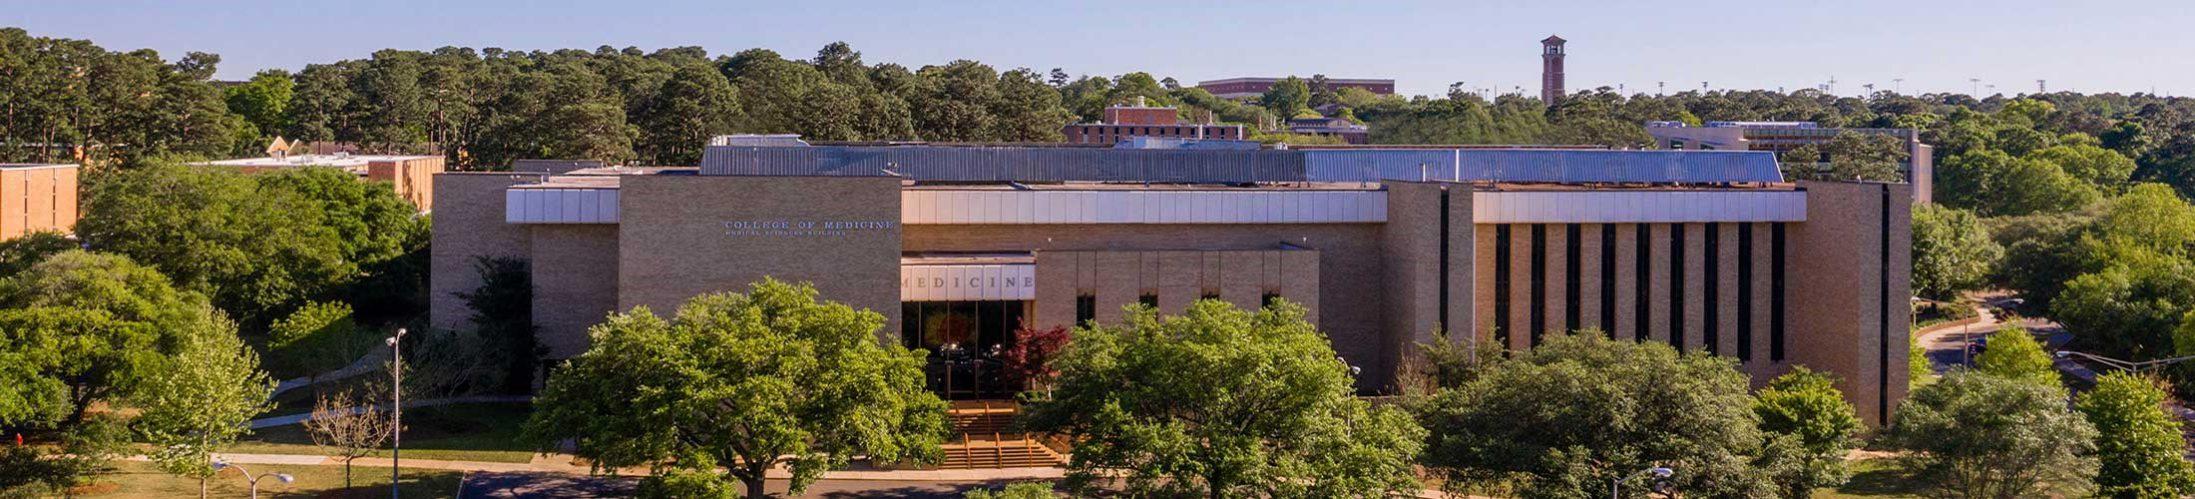 University of South Alabama-